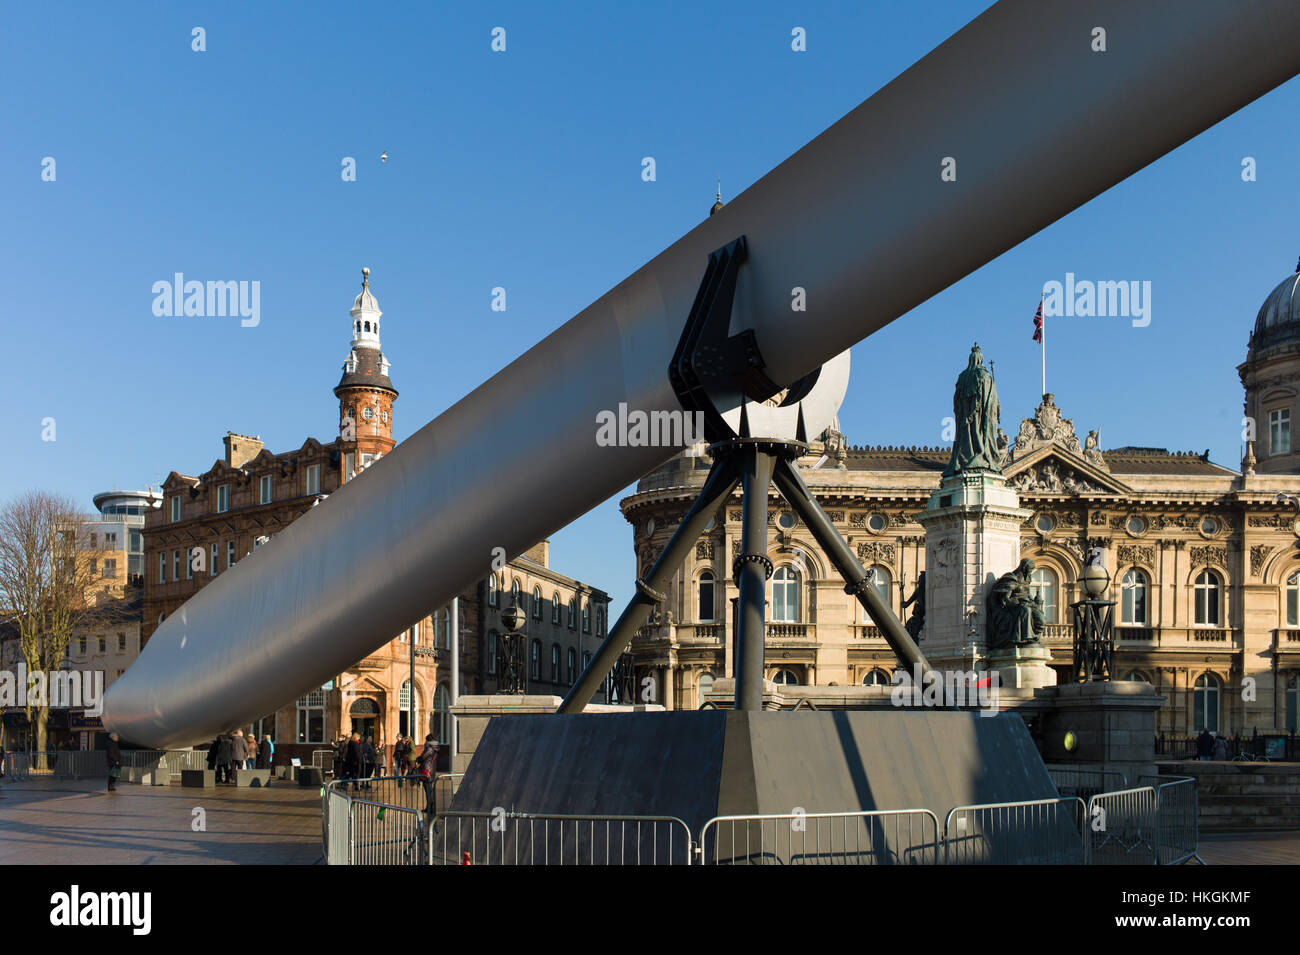 Hull City of Culture The blade  by nayan kulkarni - Stock Image